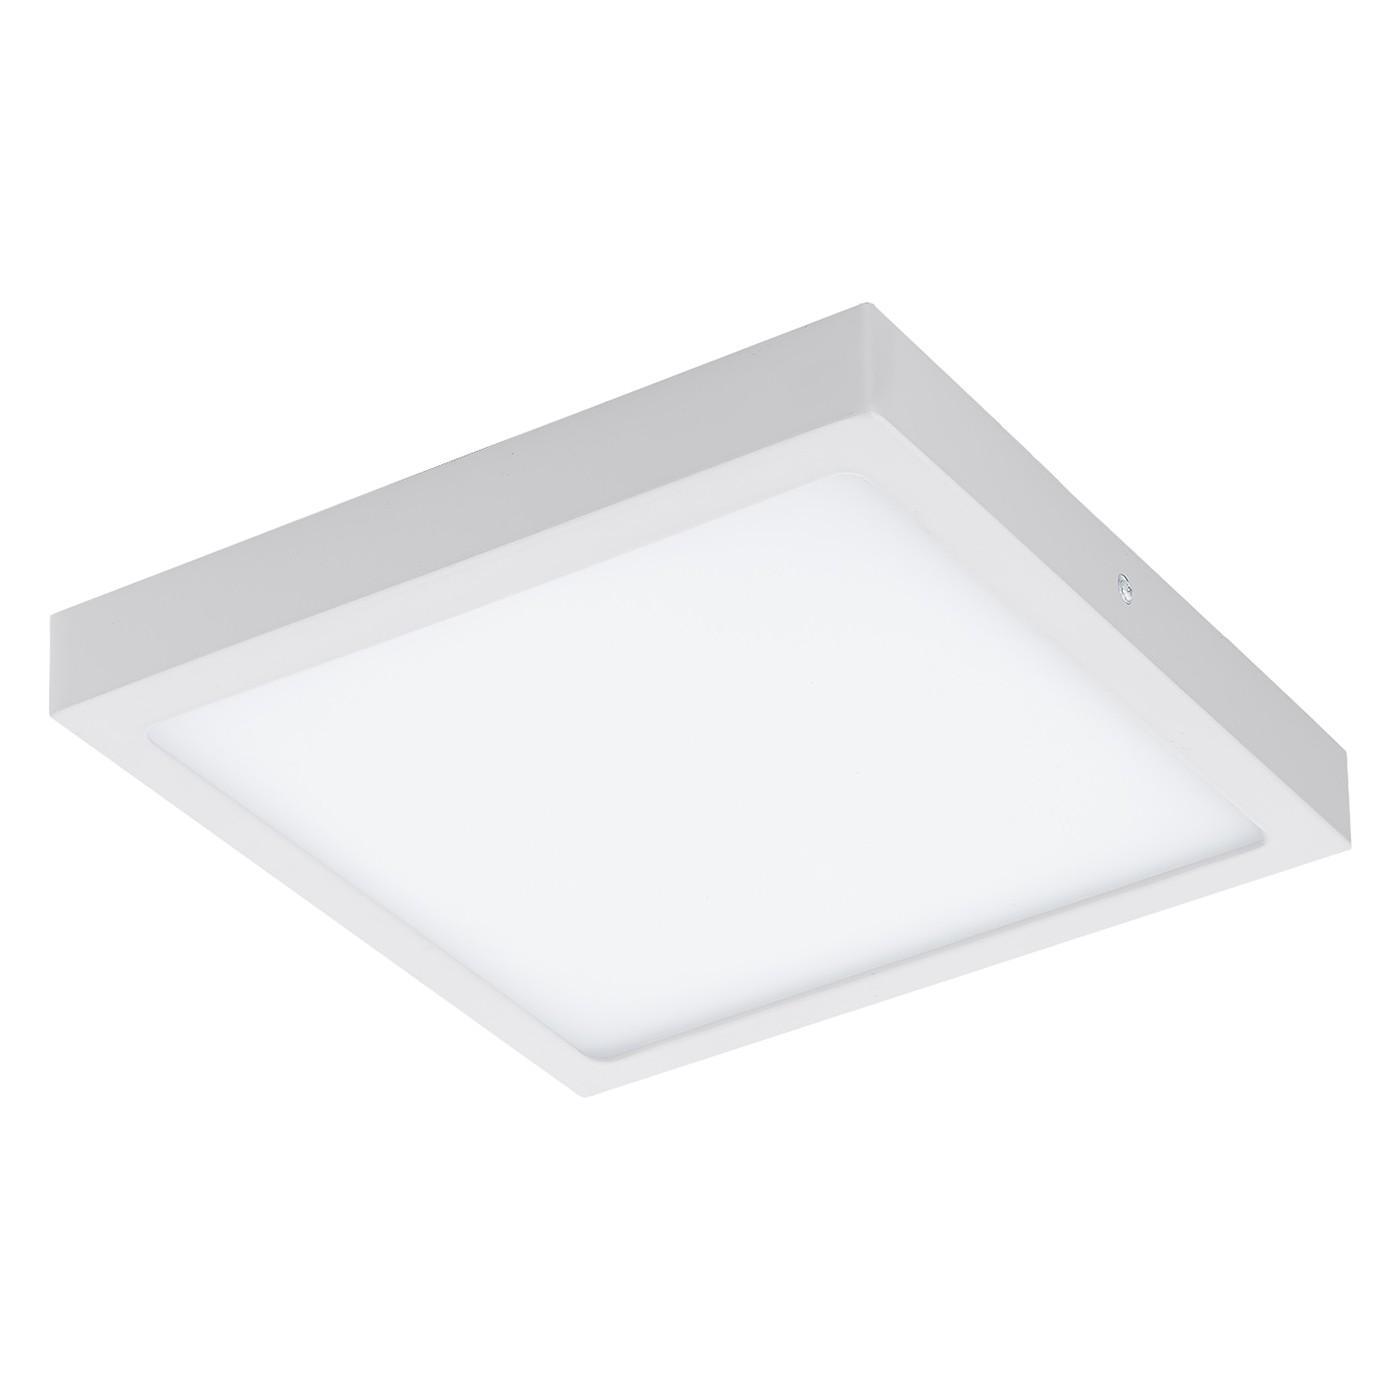 home24 LED-Deckenleuchte Fueva VI